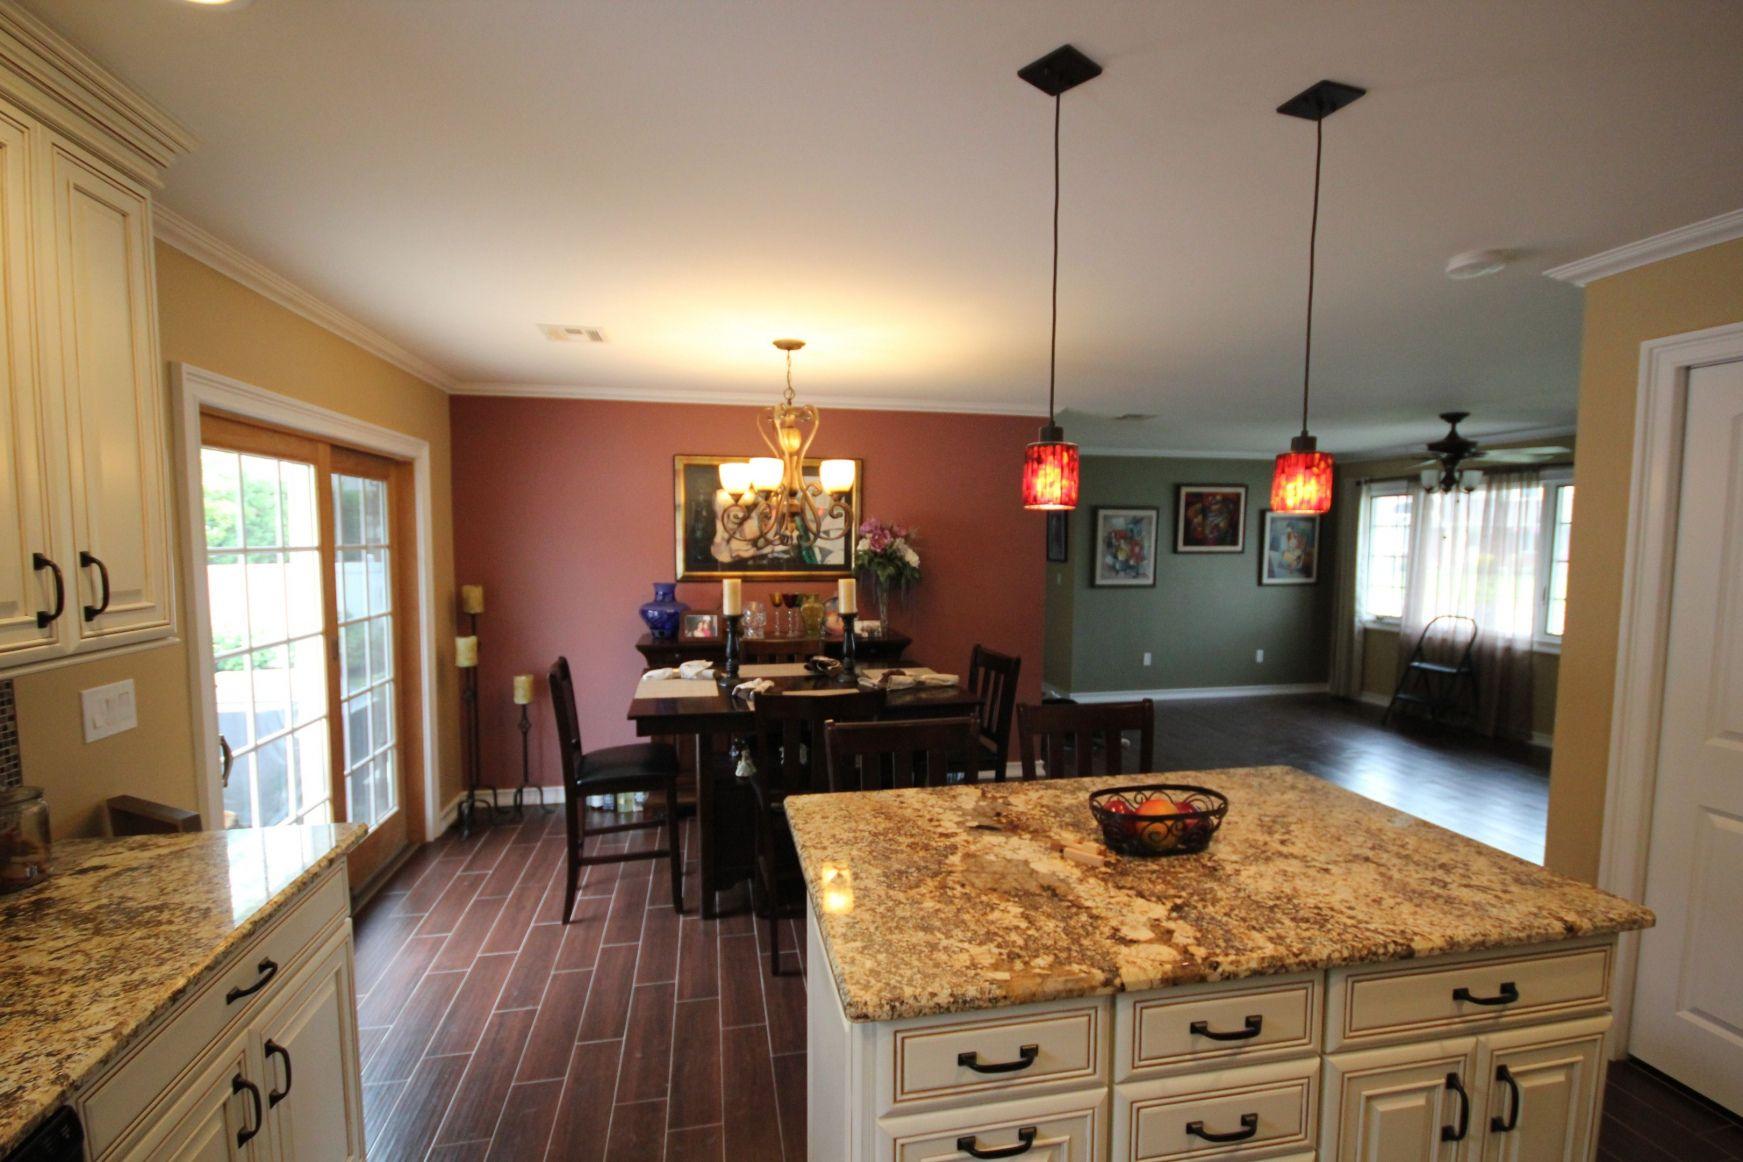 Lowes Kitchen Lighting Ideas  Lowes Paint Colors Interior Check Amazing Kitchen Lighting Lowes Design Decoration